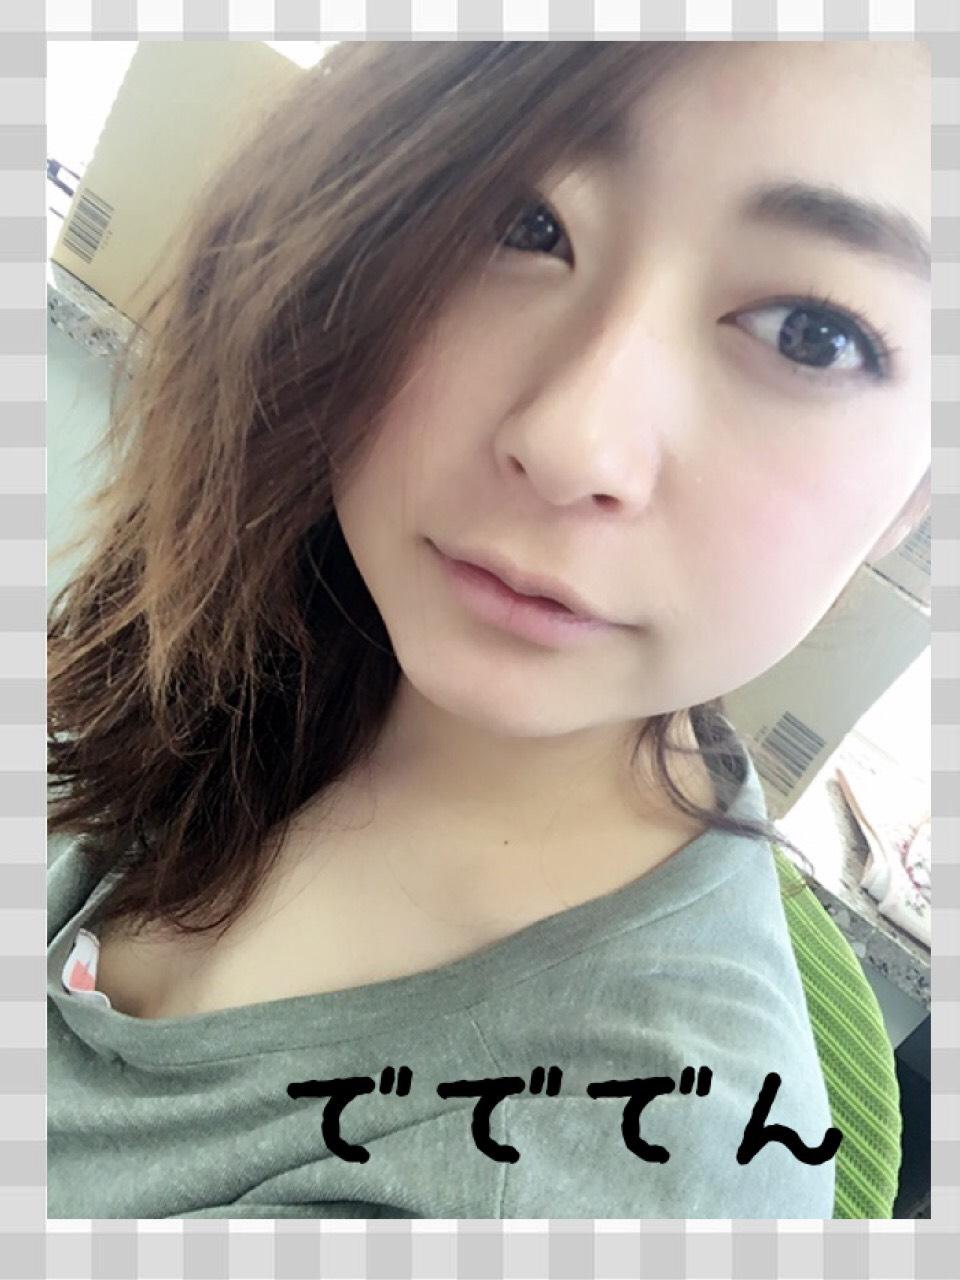 S__4751385.jpg